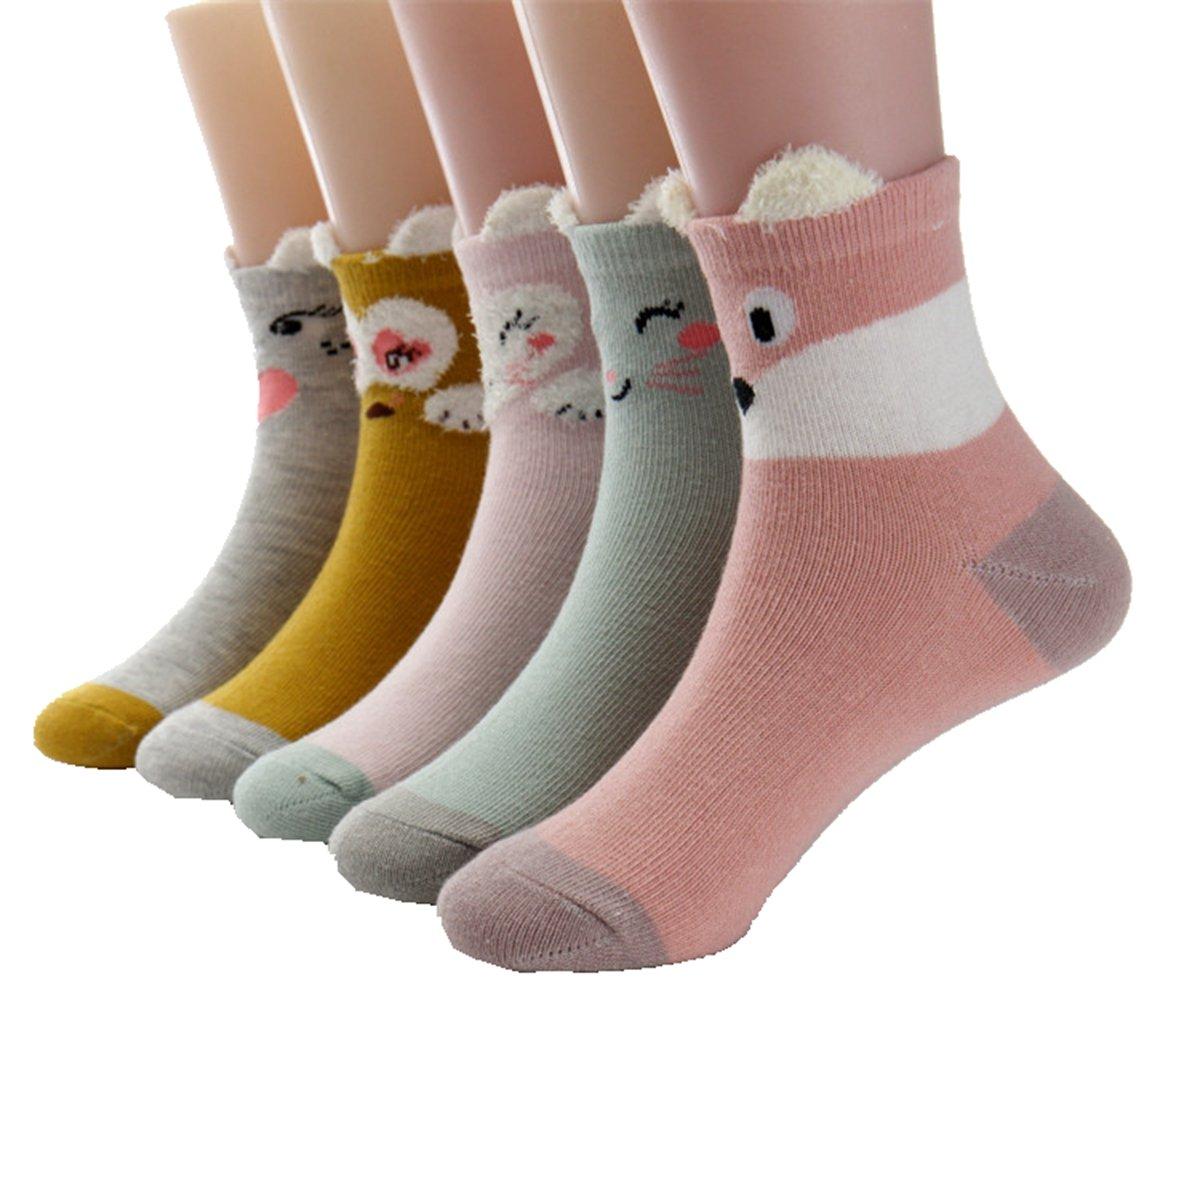 Little Girls Socks Cotton Animals Comfort Thick Socks 5 Pair Pack Cczmfeas